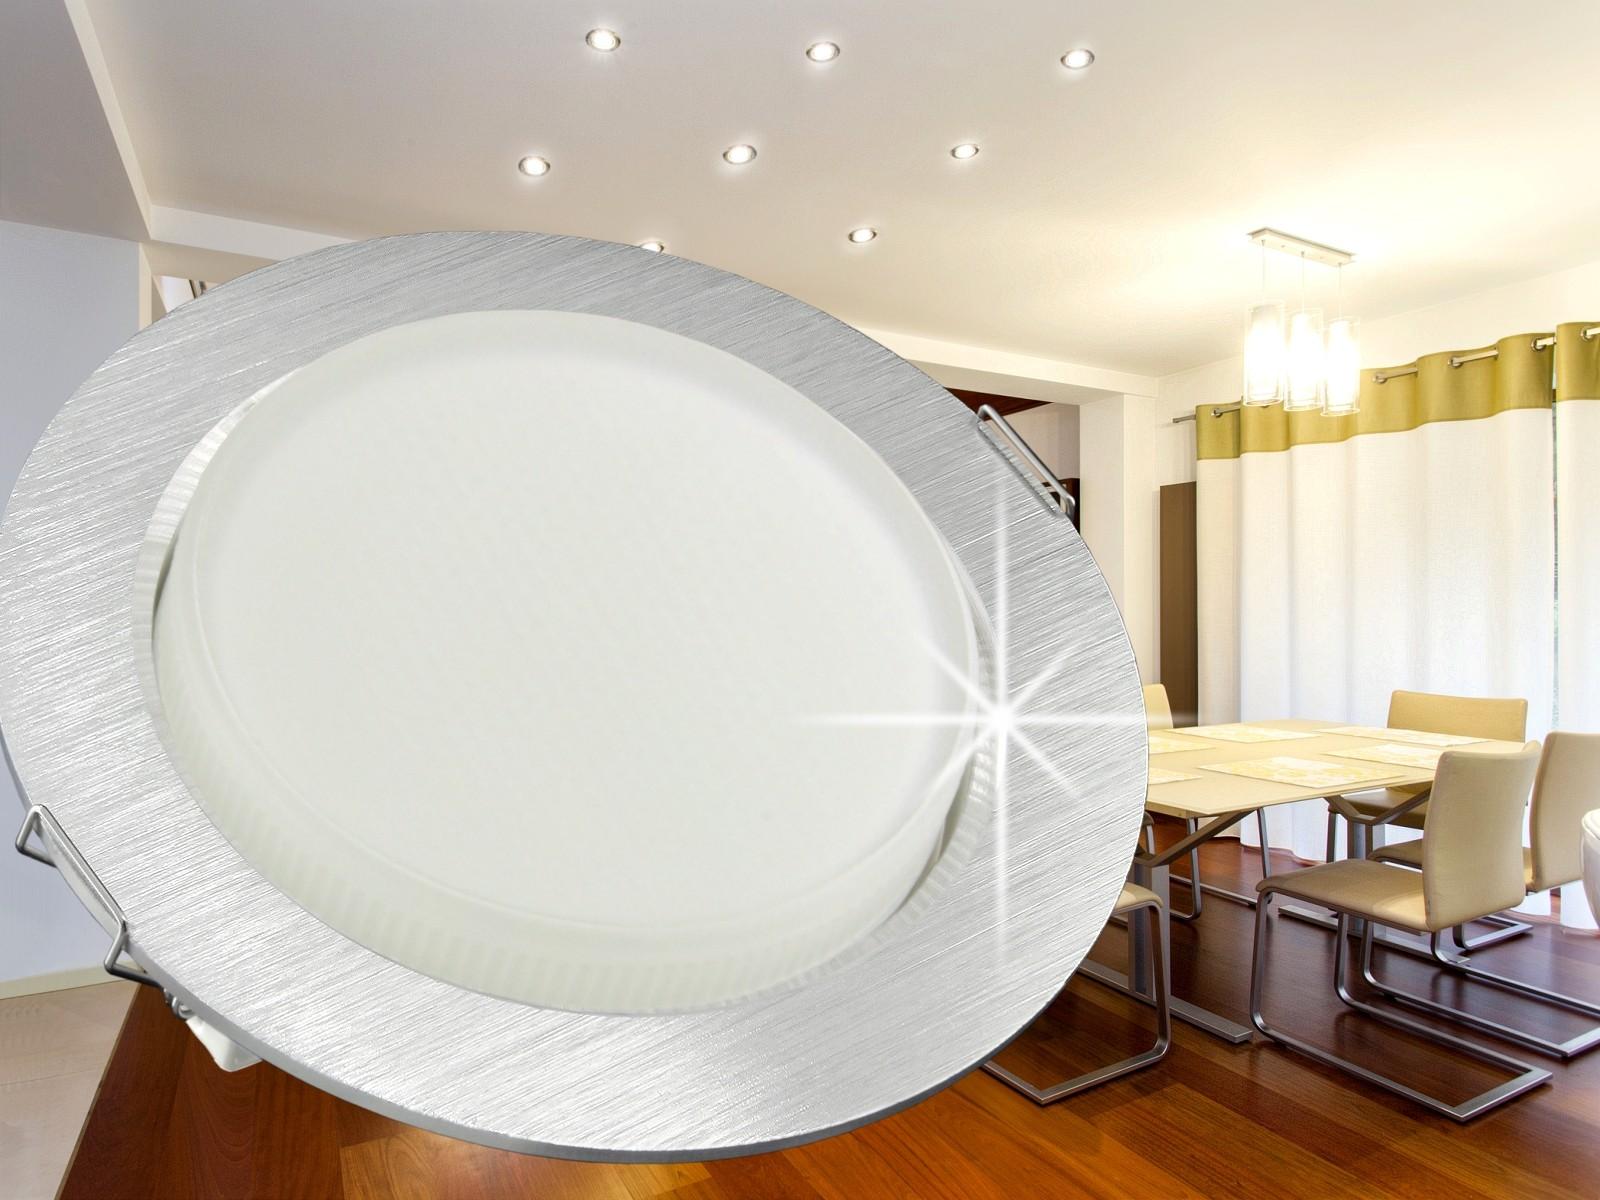 rx 3 alu led einbauleuchte geringe einbautiefe gx53 5 5w. Black Bedroom Furniture Sets. Home Design Ideas